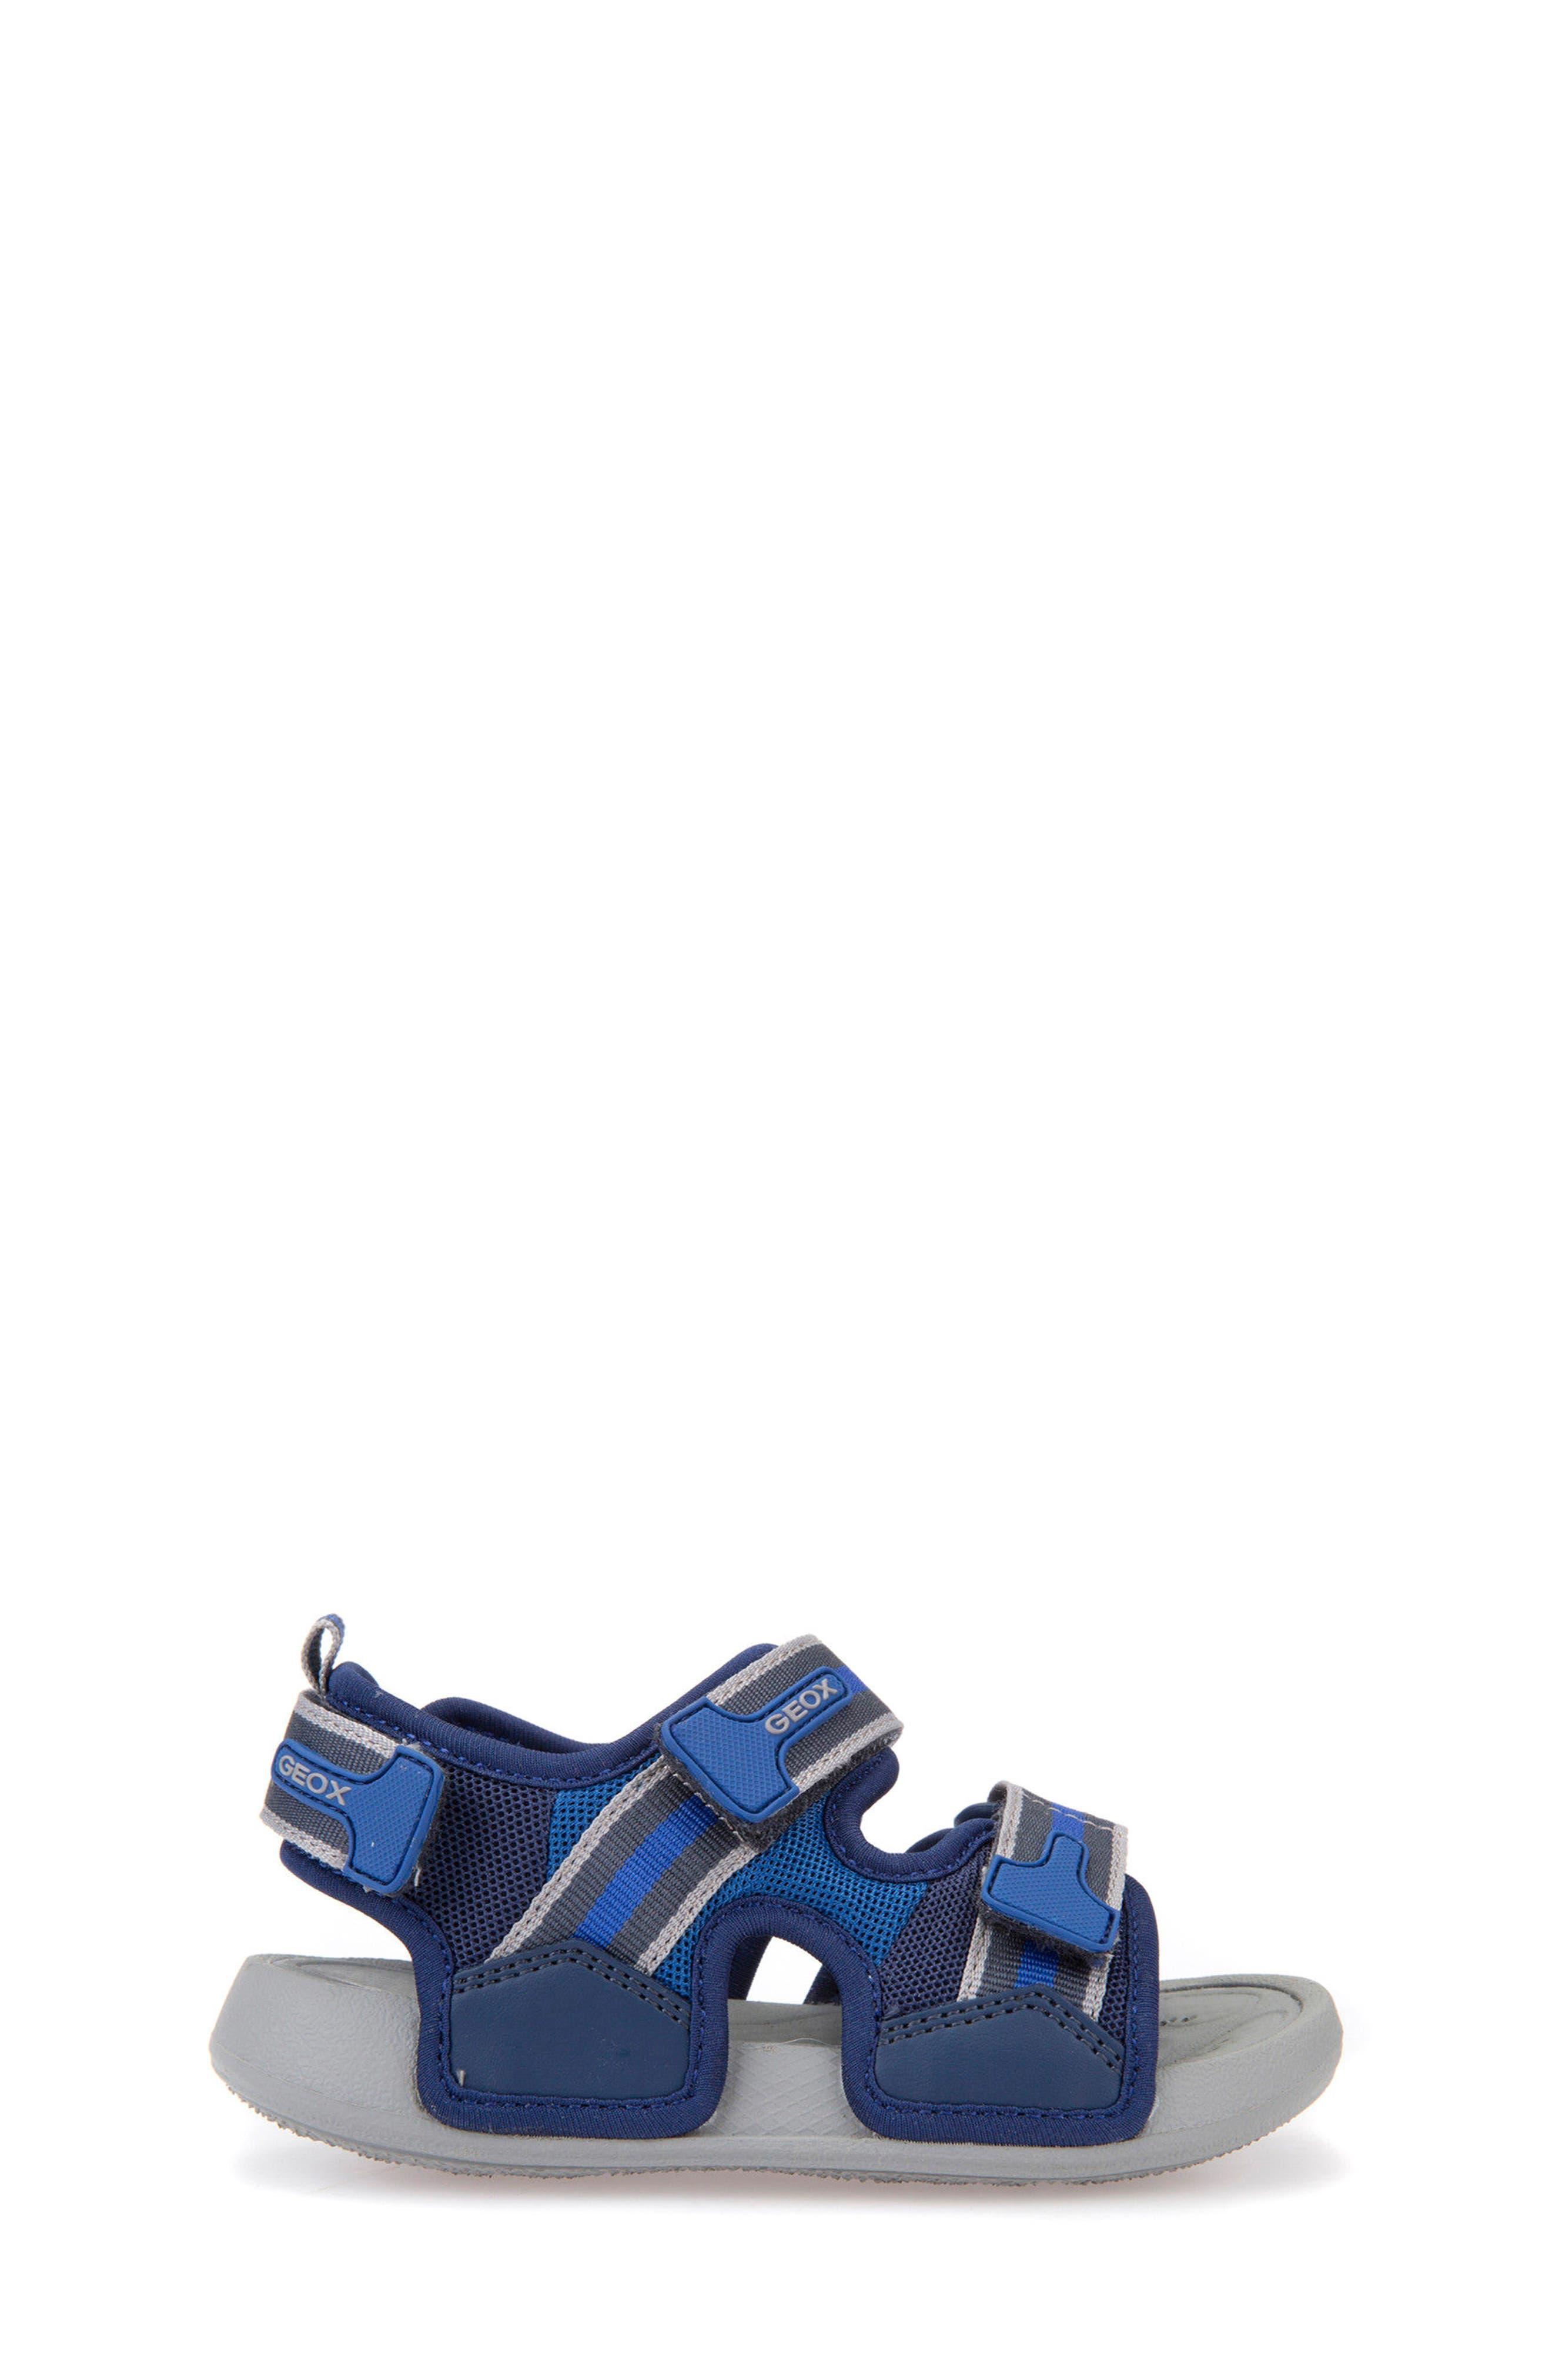 Ultrak Sandal,                             Alternate thumbnail 3, color,                             Navy/ Royal